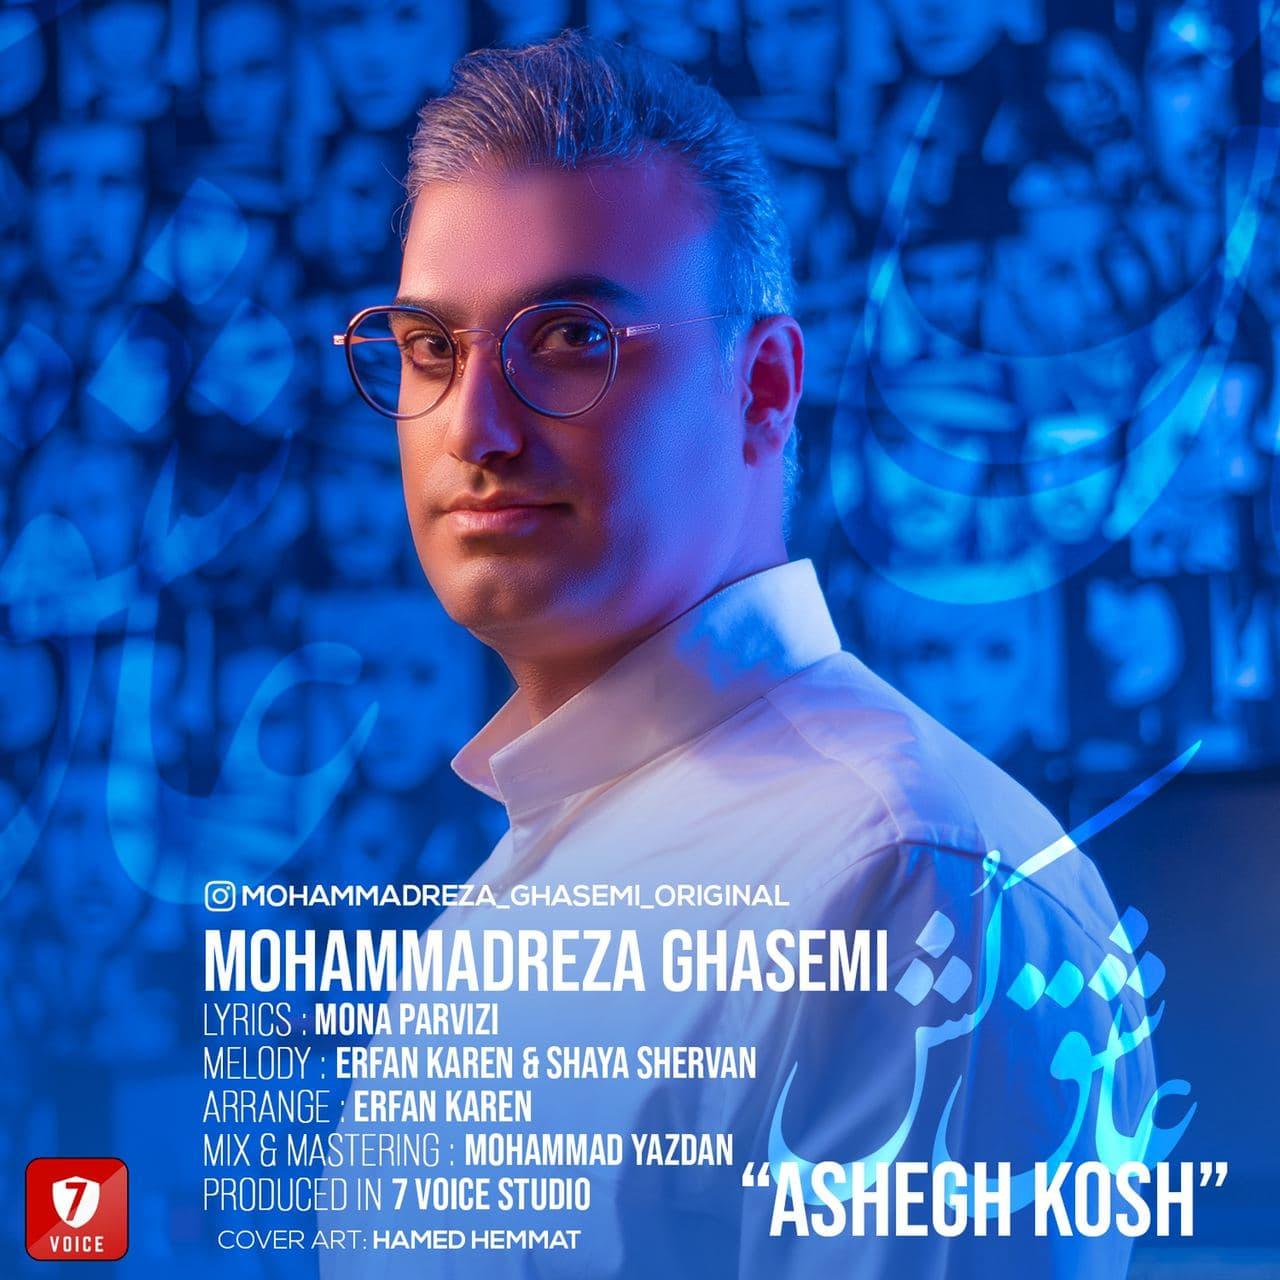 Mohammadreza Ghasemi – Ashegh Kosh